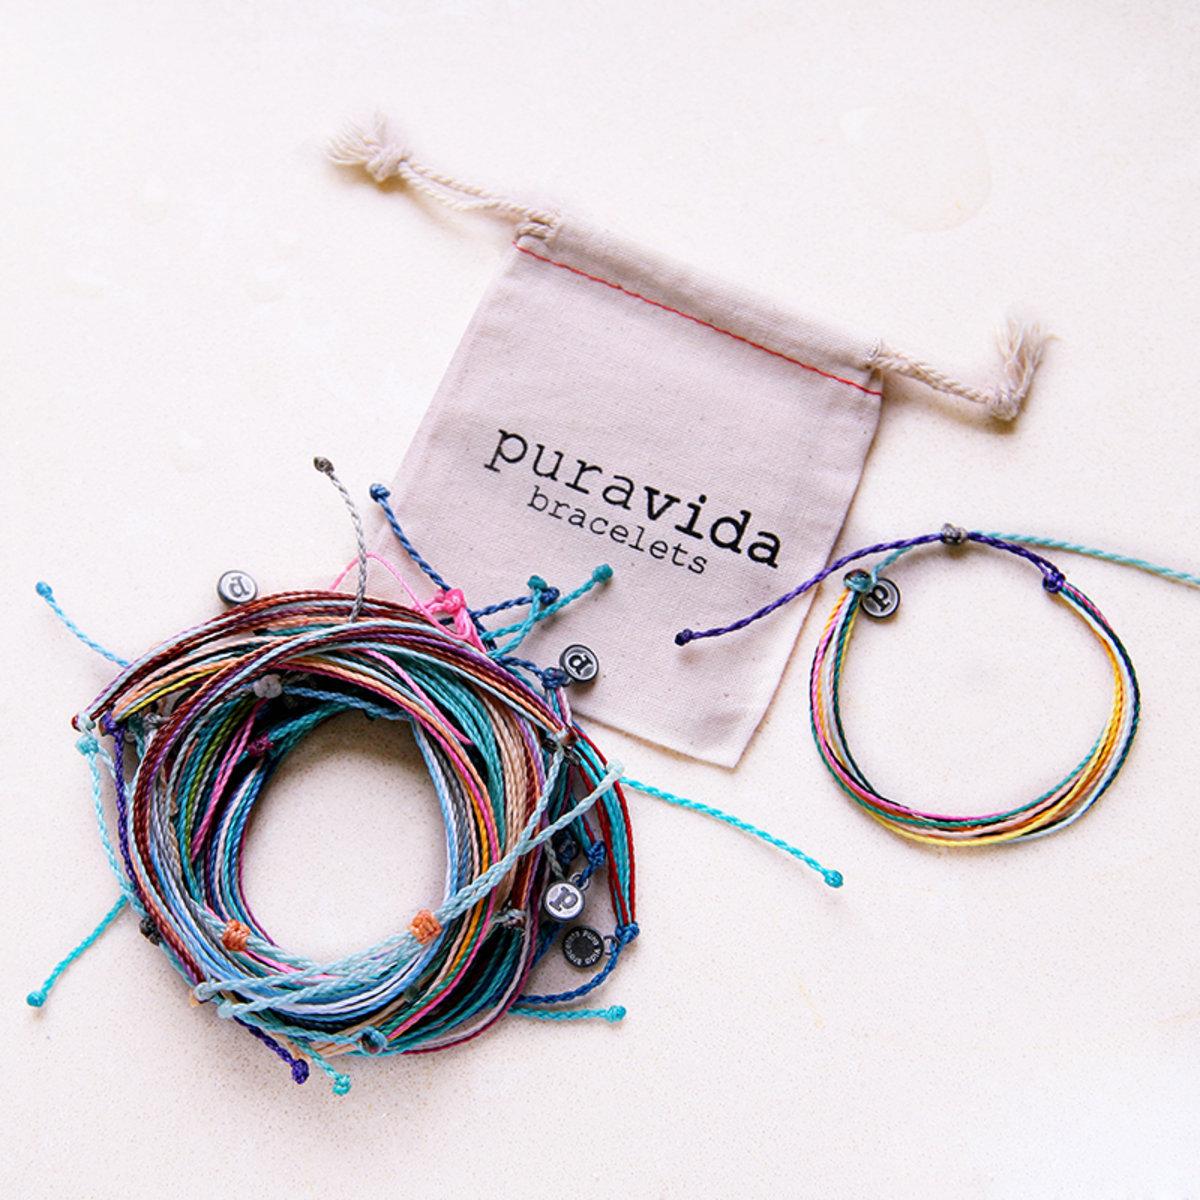 81ad9b68d180c Pura Vida | Friendship Pack Originals | Color : Multi-Color | Size ...